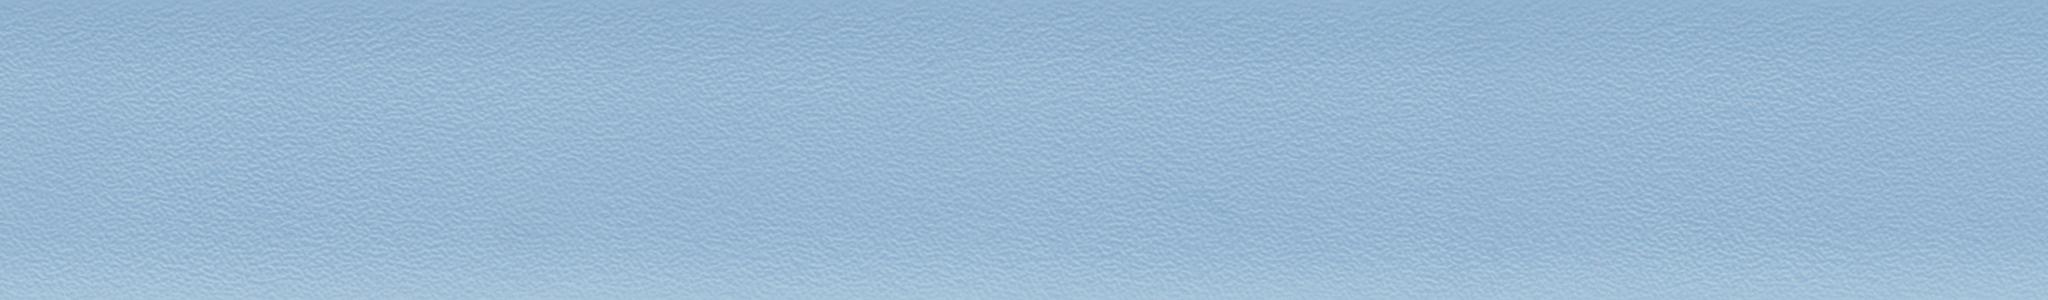 HU 15621 ABS hrana modrá světlá perla 101